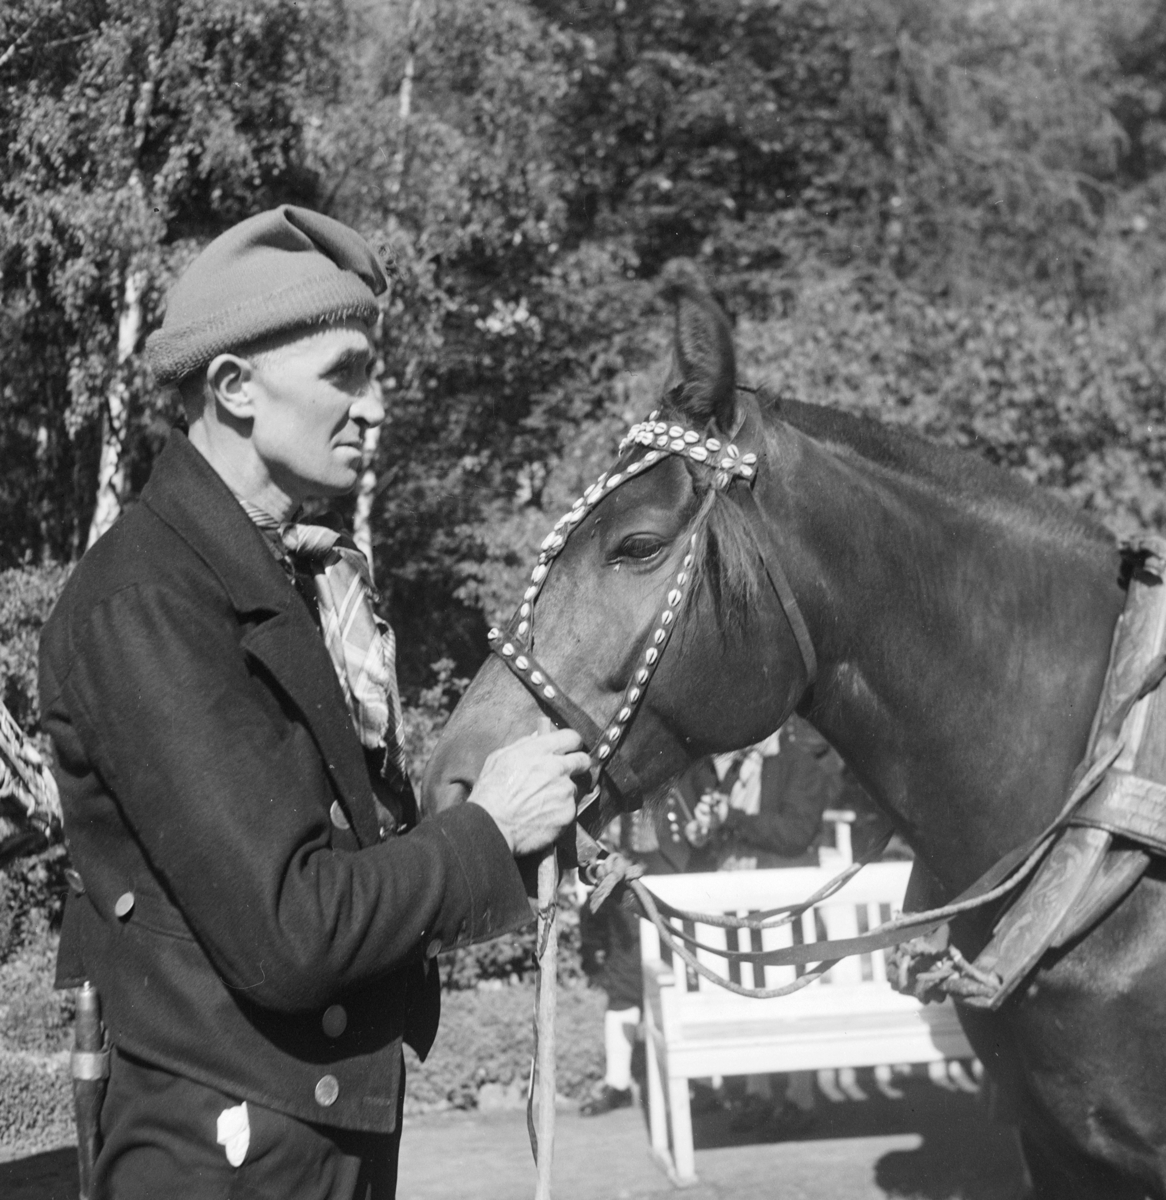 Hamardagen 1946.